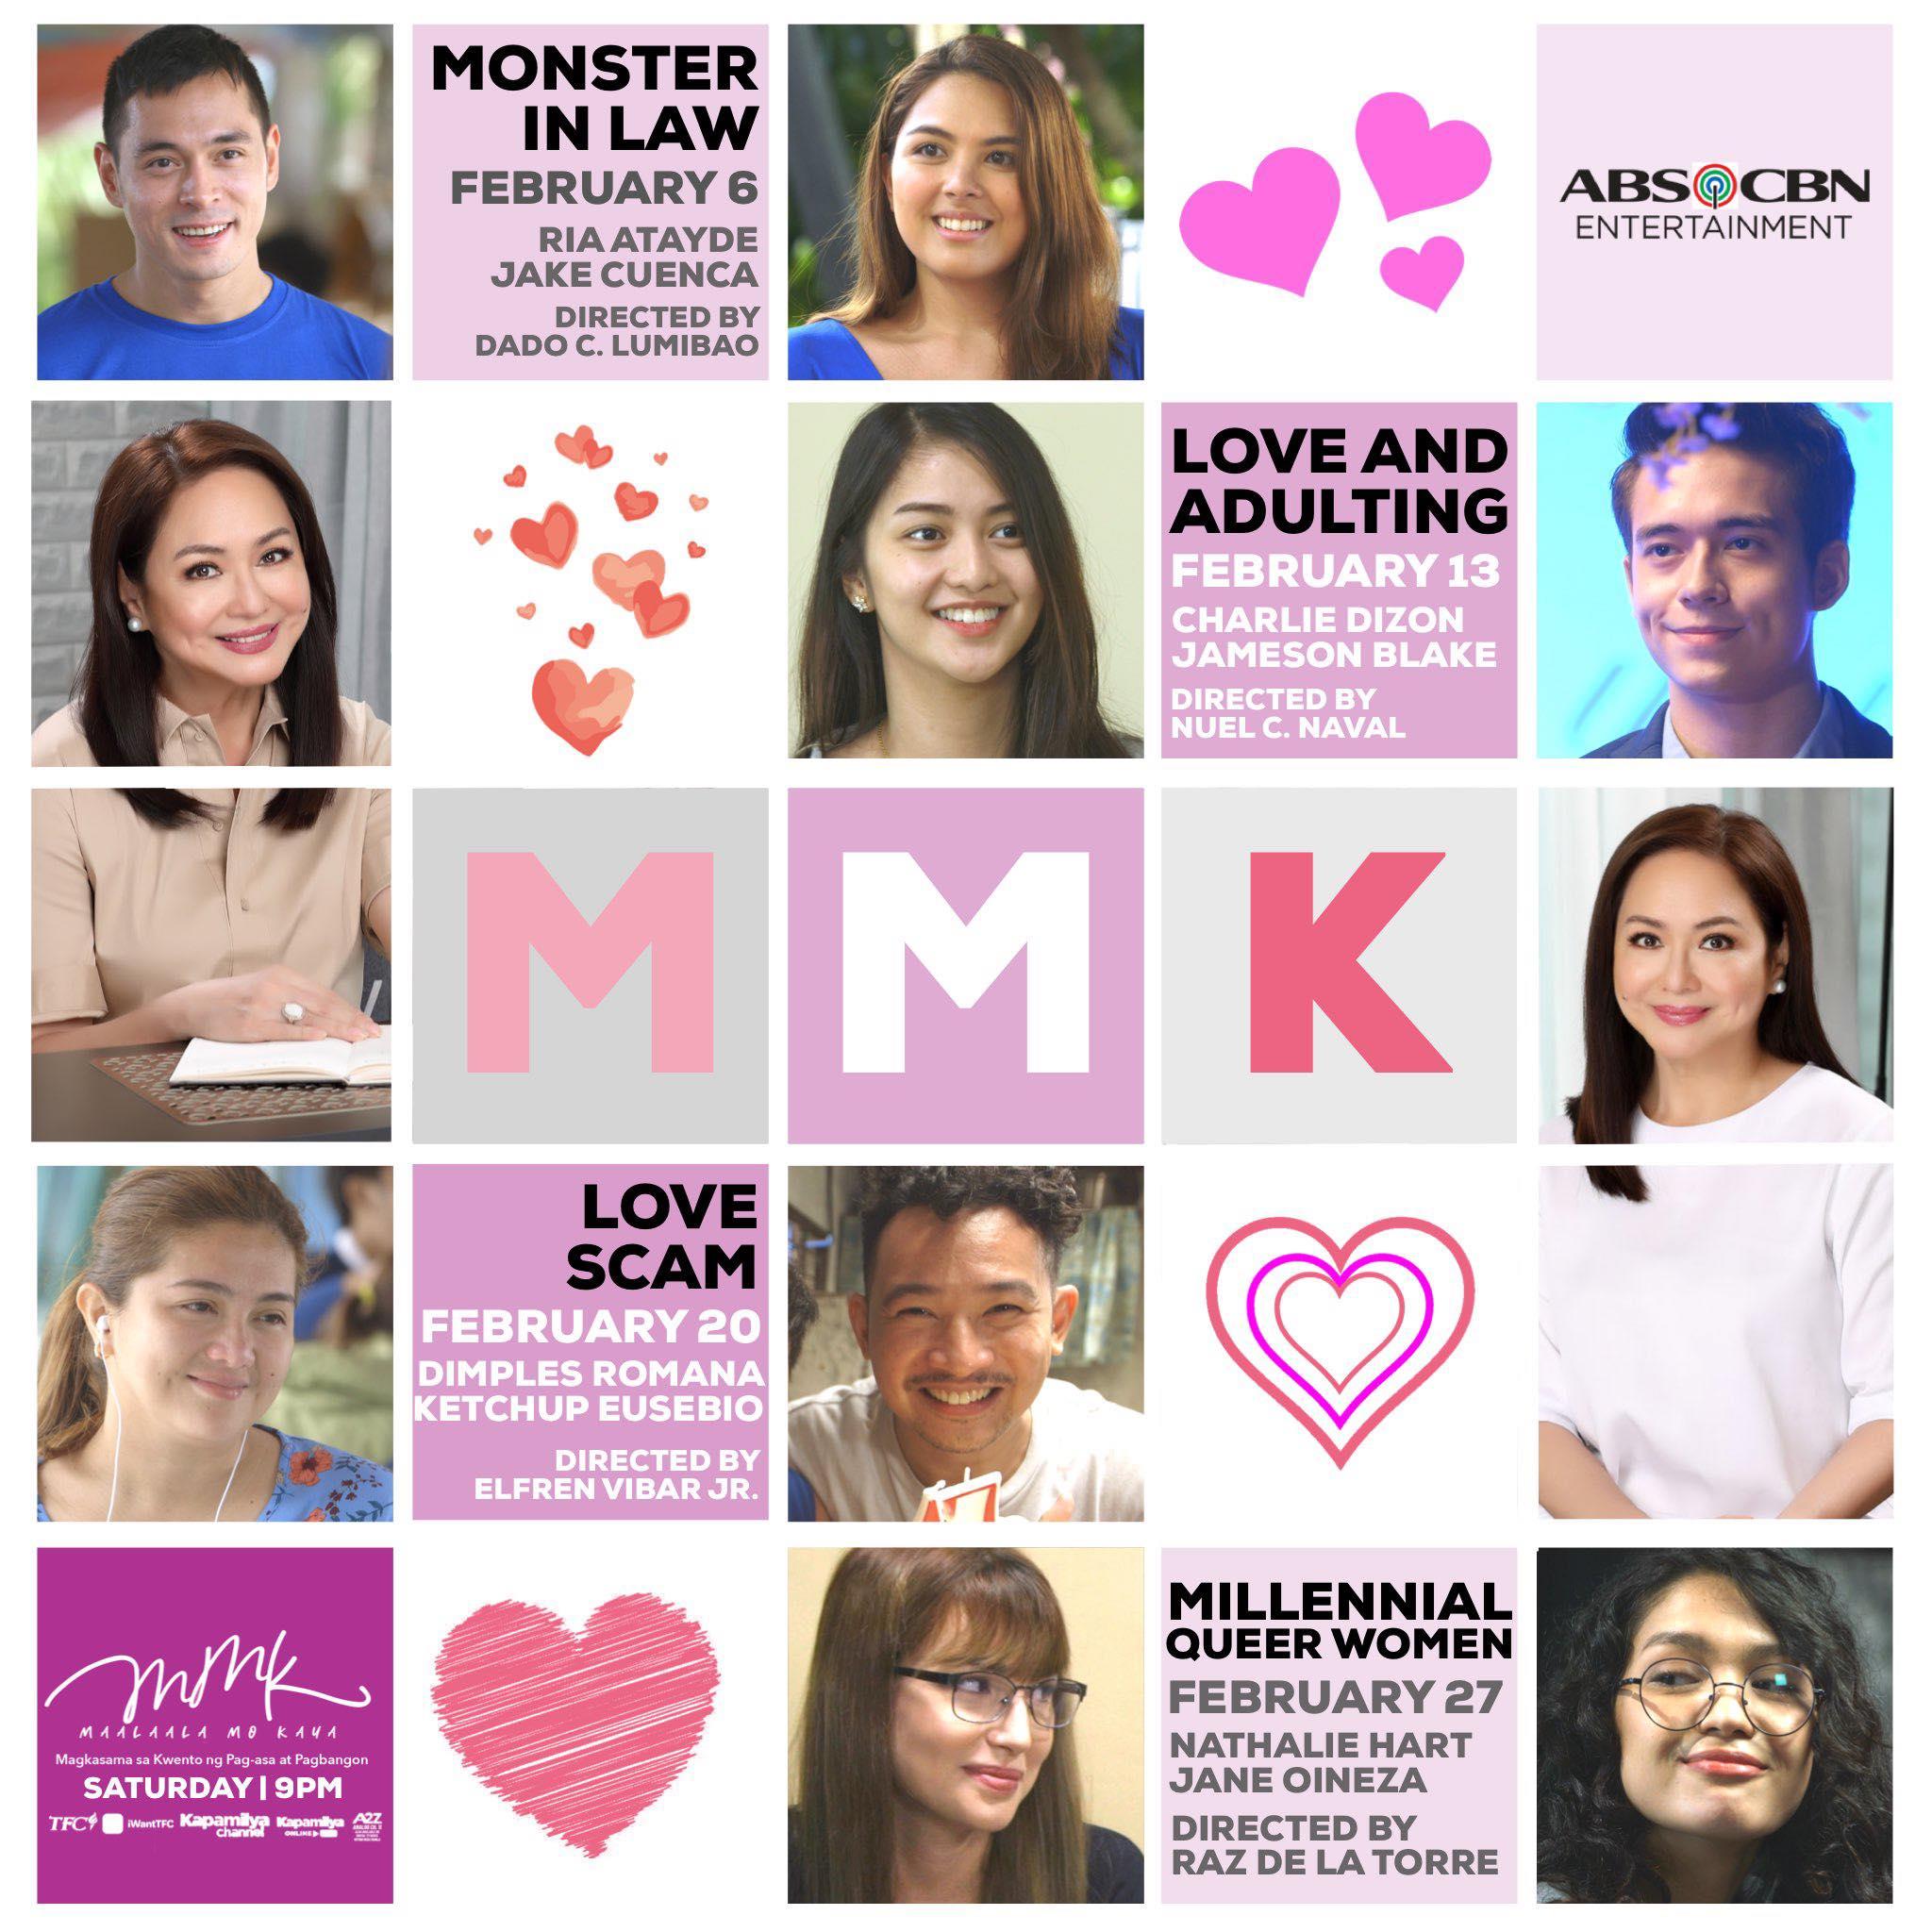 MMK episode lineup